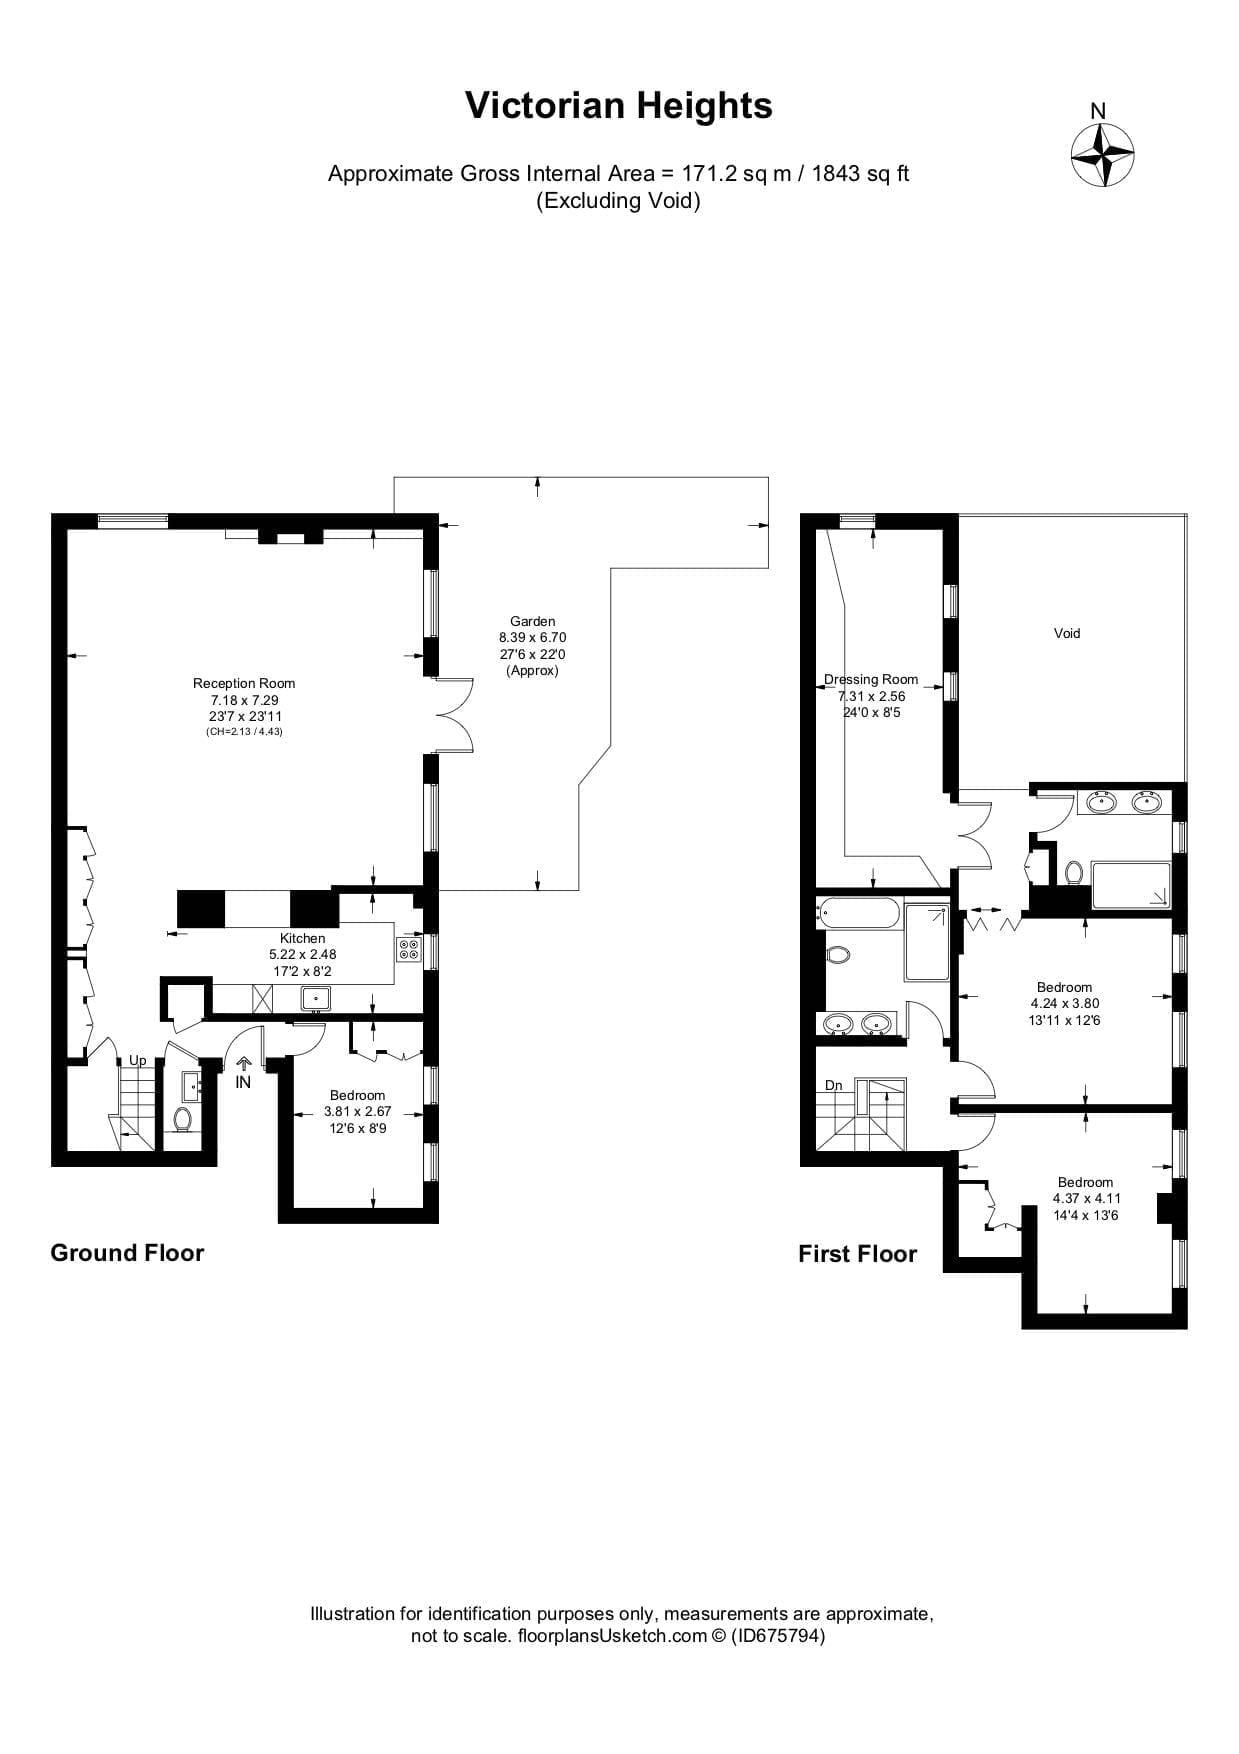 Victorian-heights-thackeray-road-sw8-floorplan